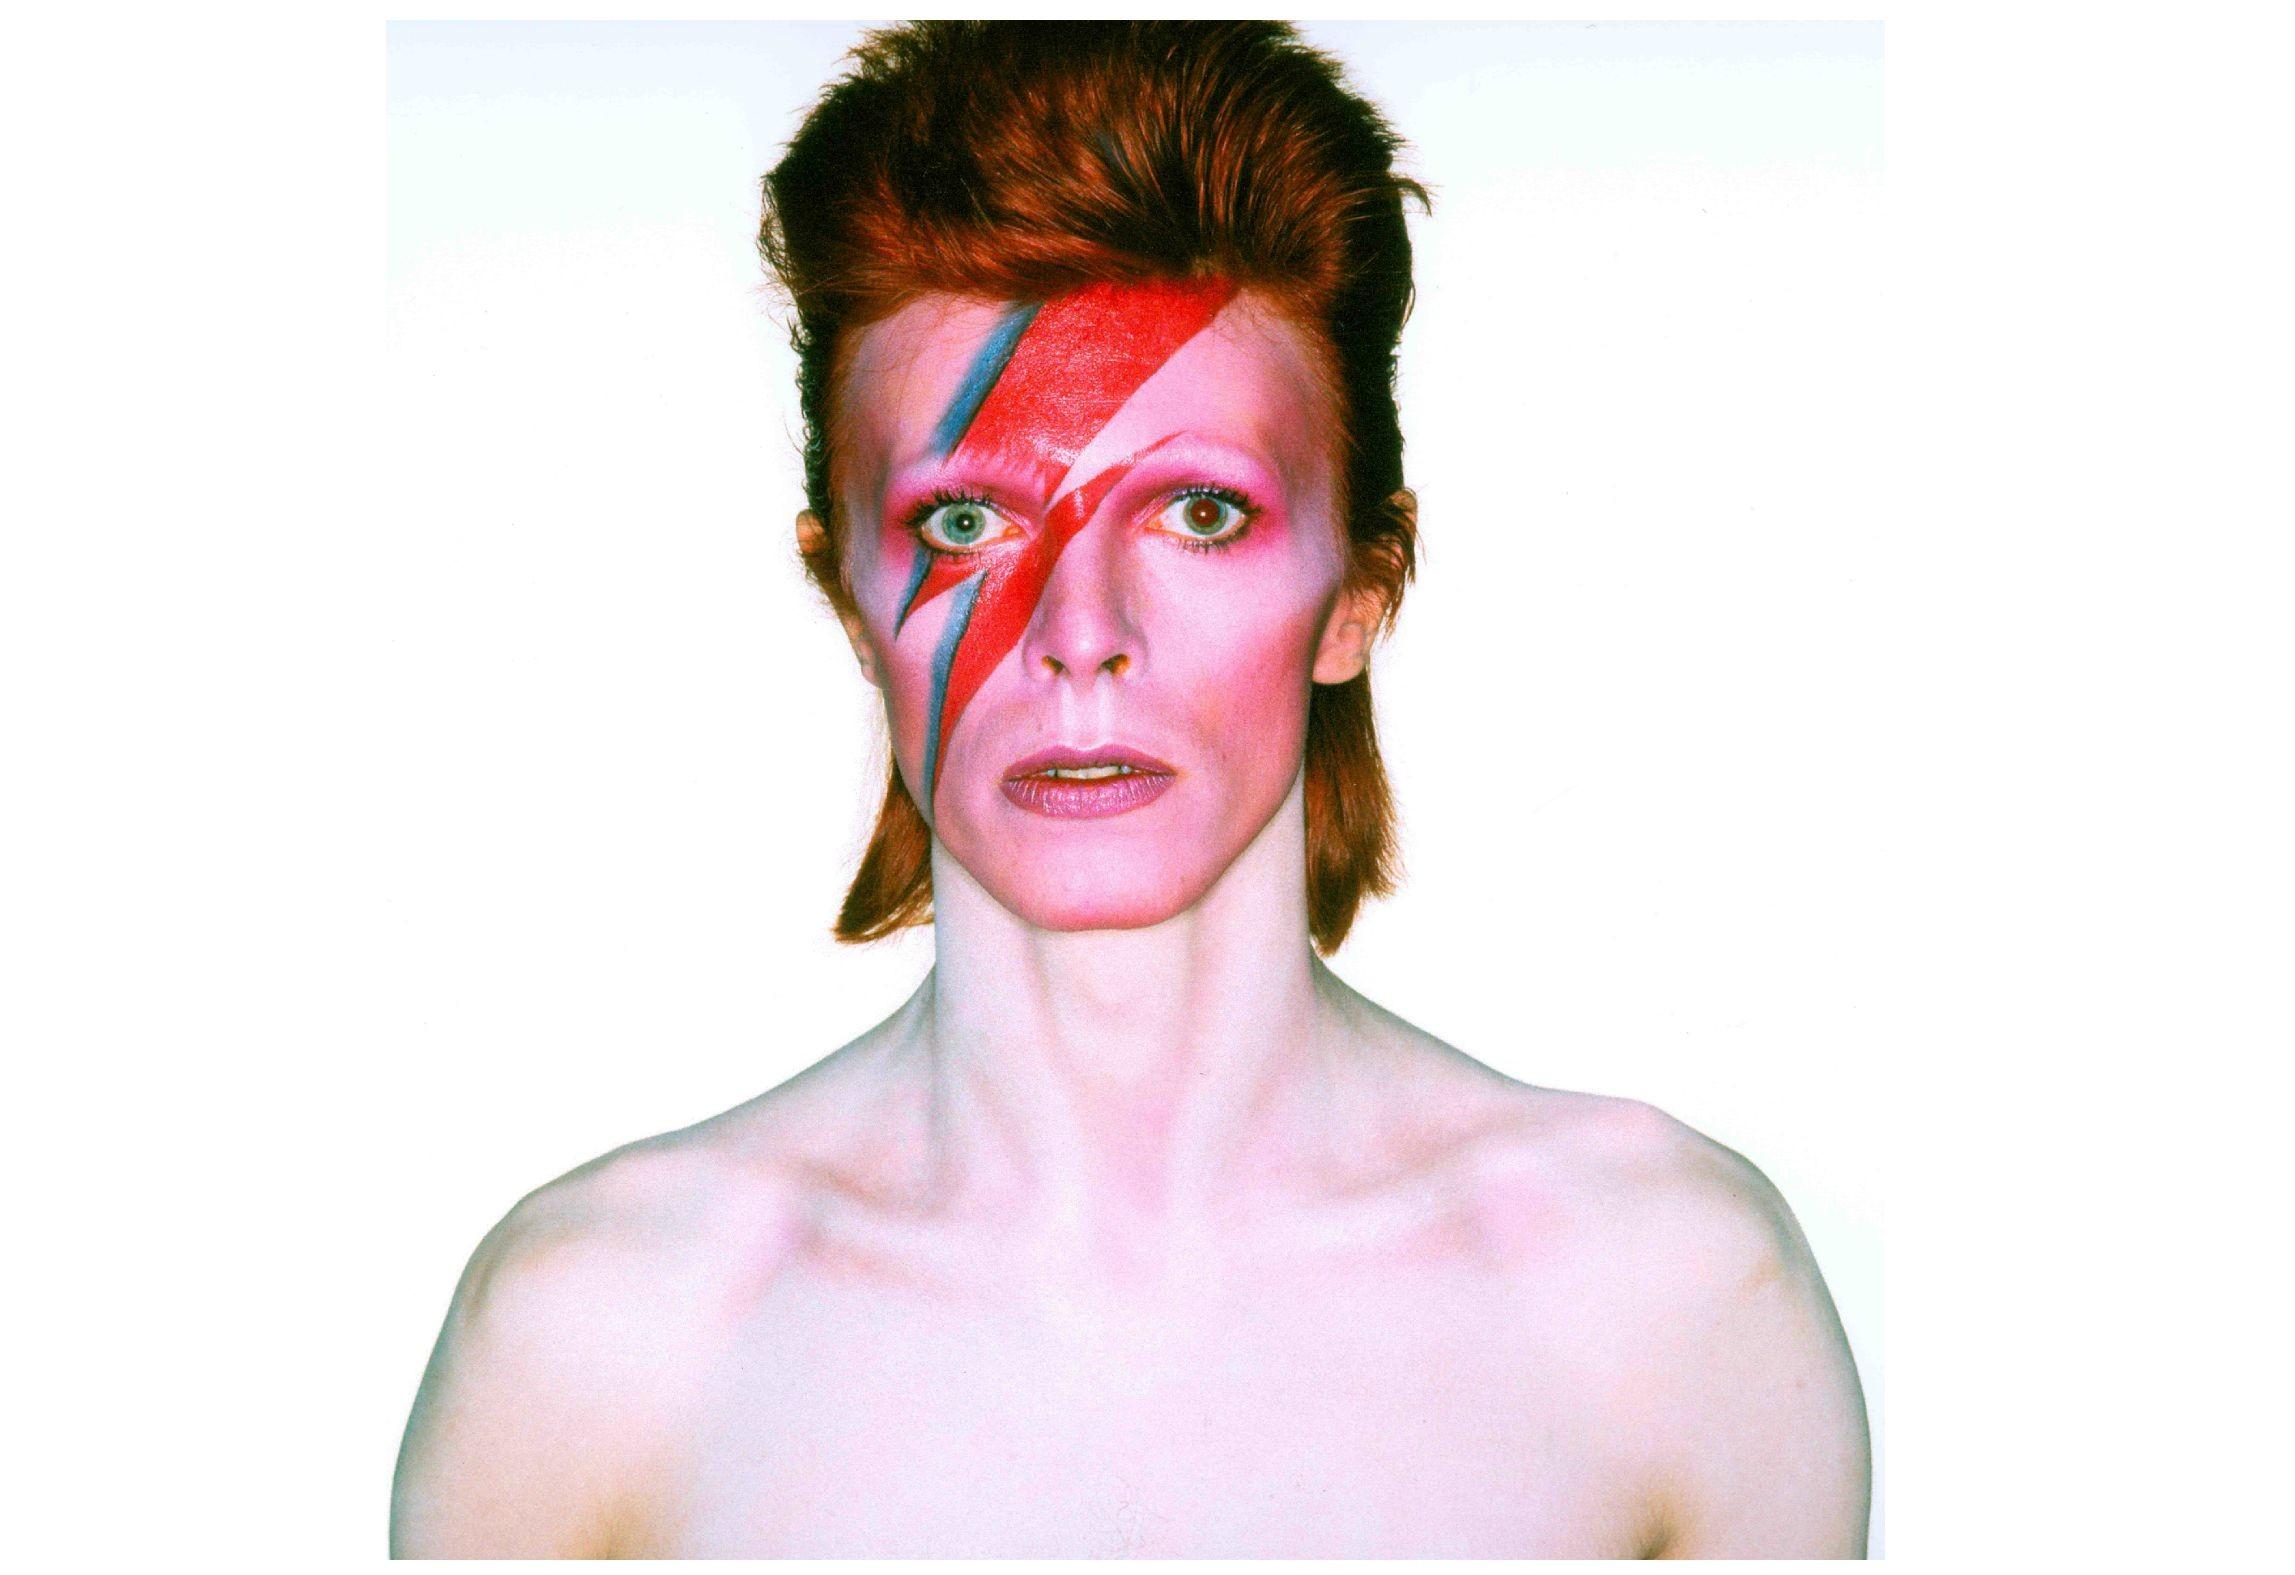 David Bowie, channelling Mercury